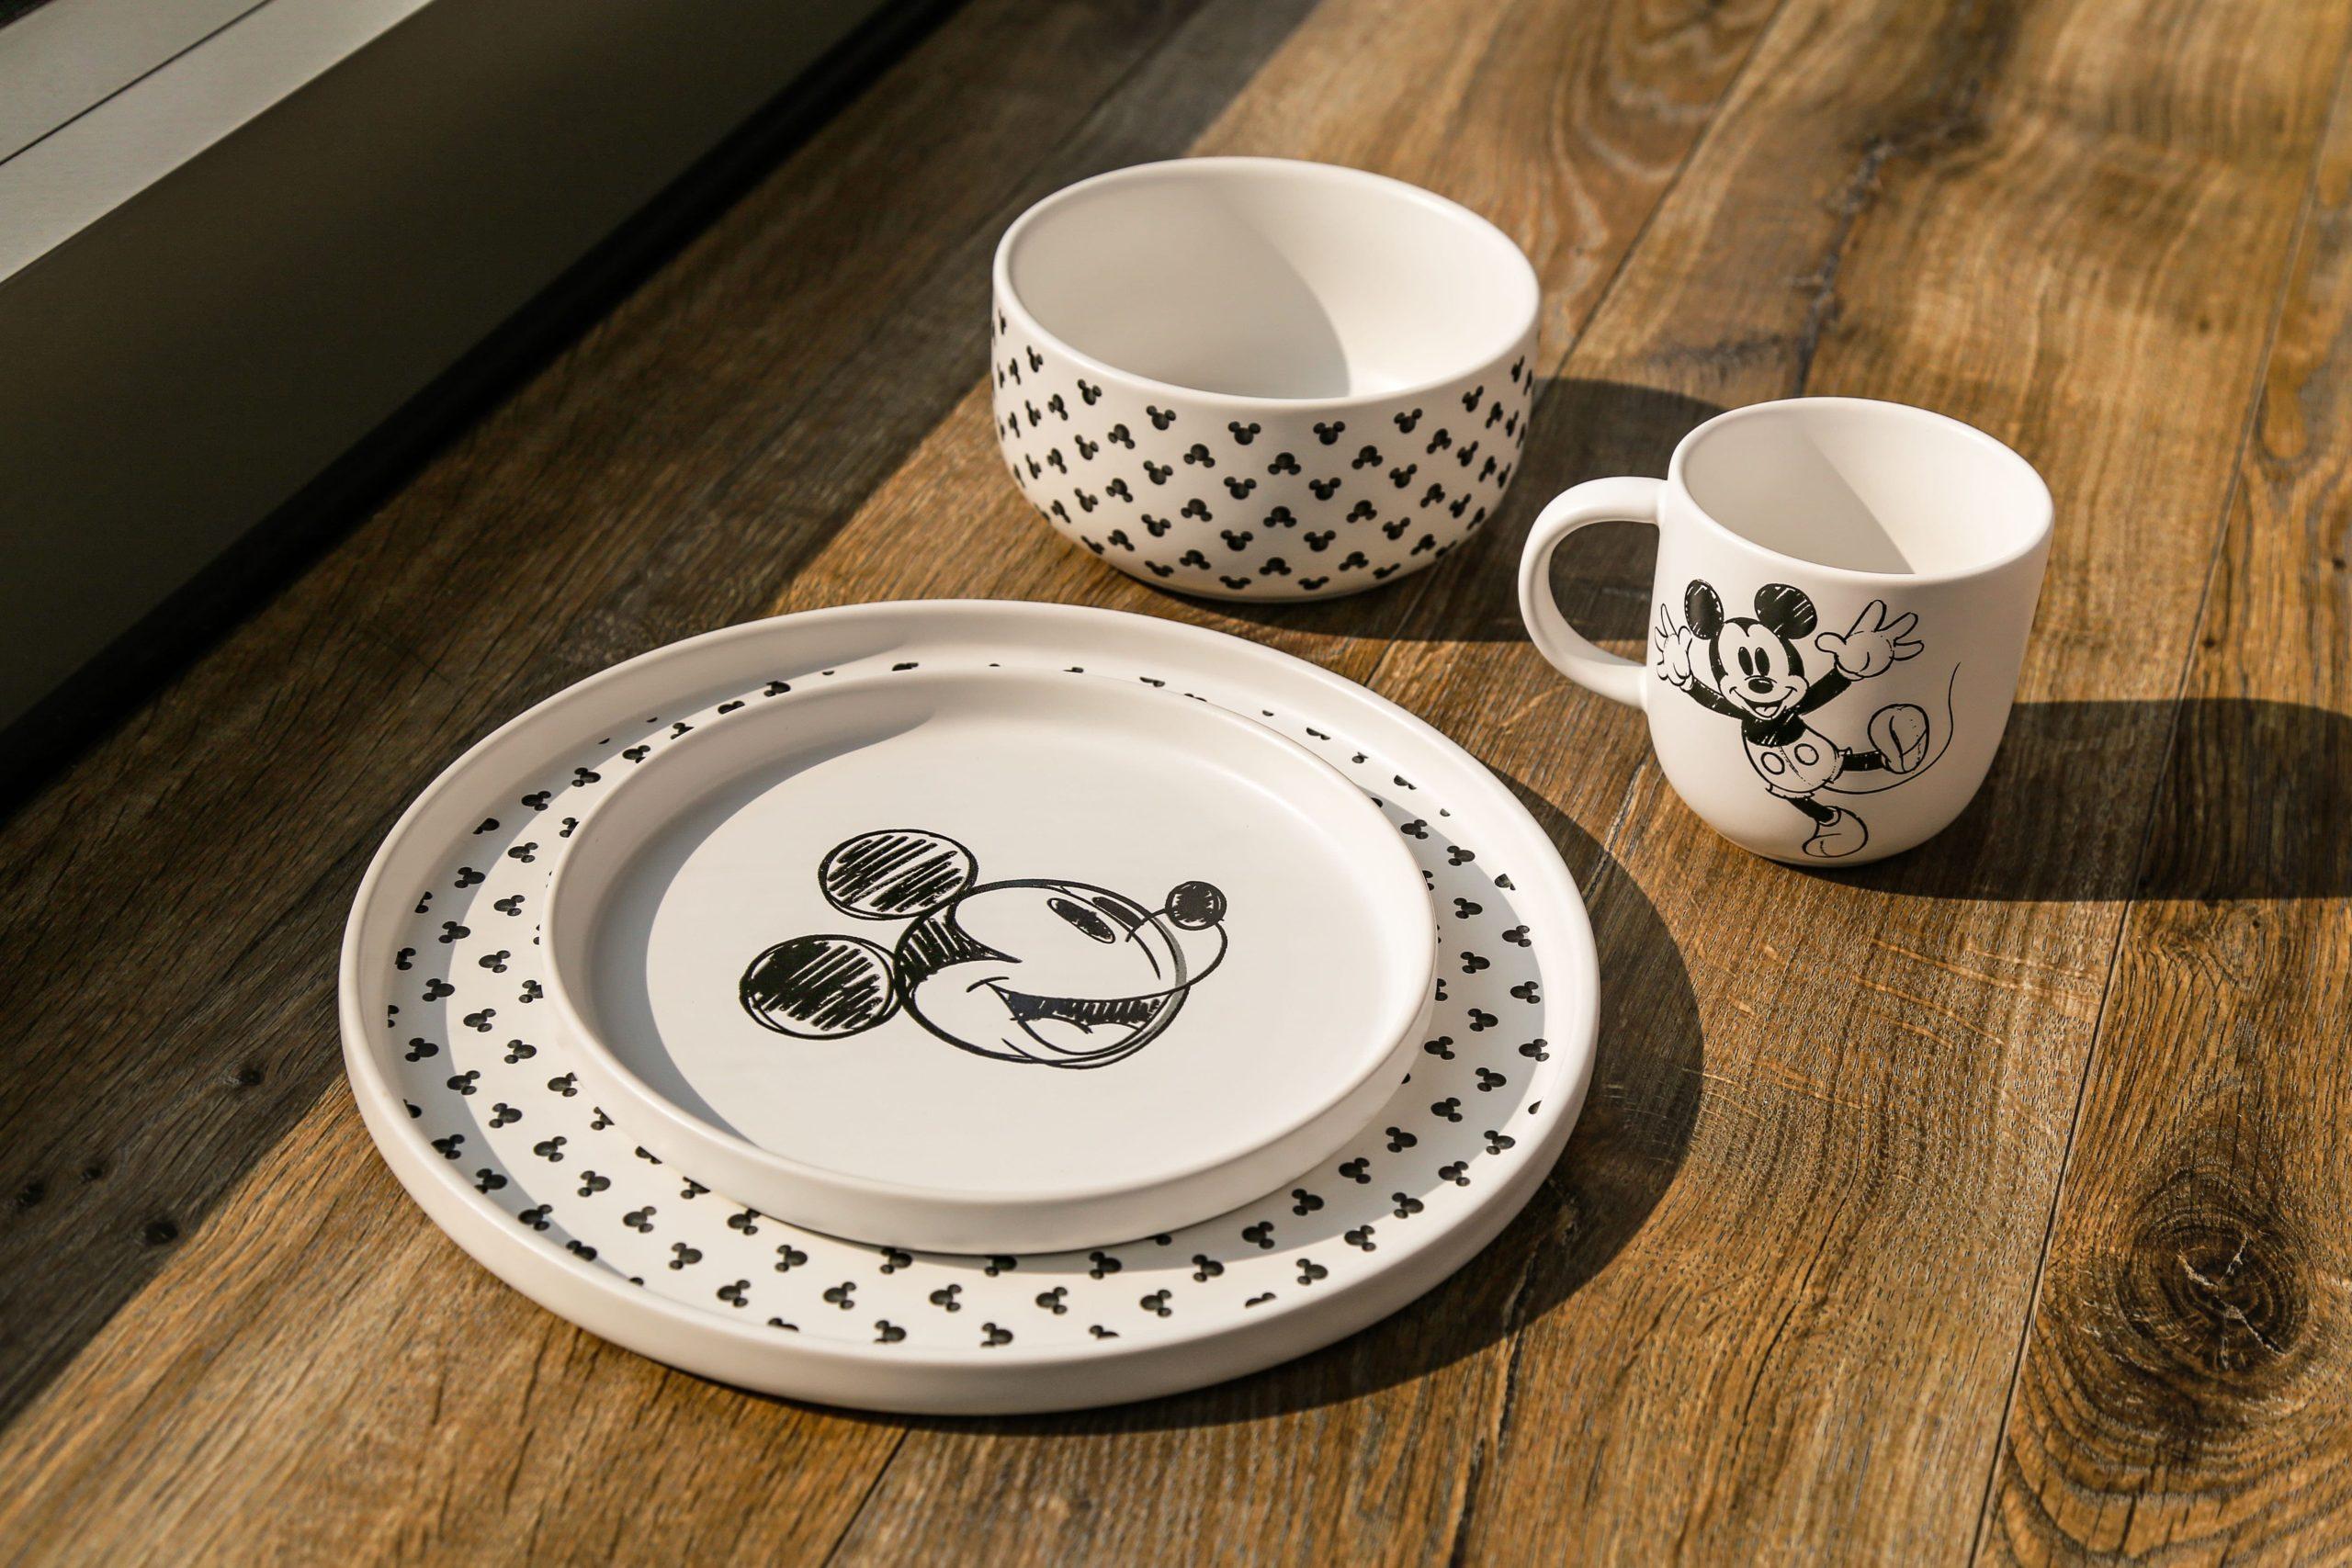 Fairprice Mickey Dinnerware Set